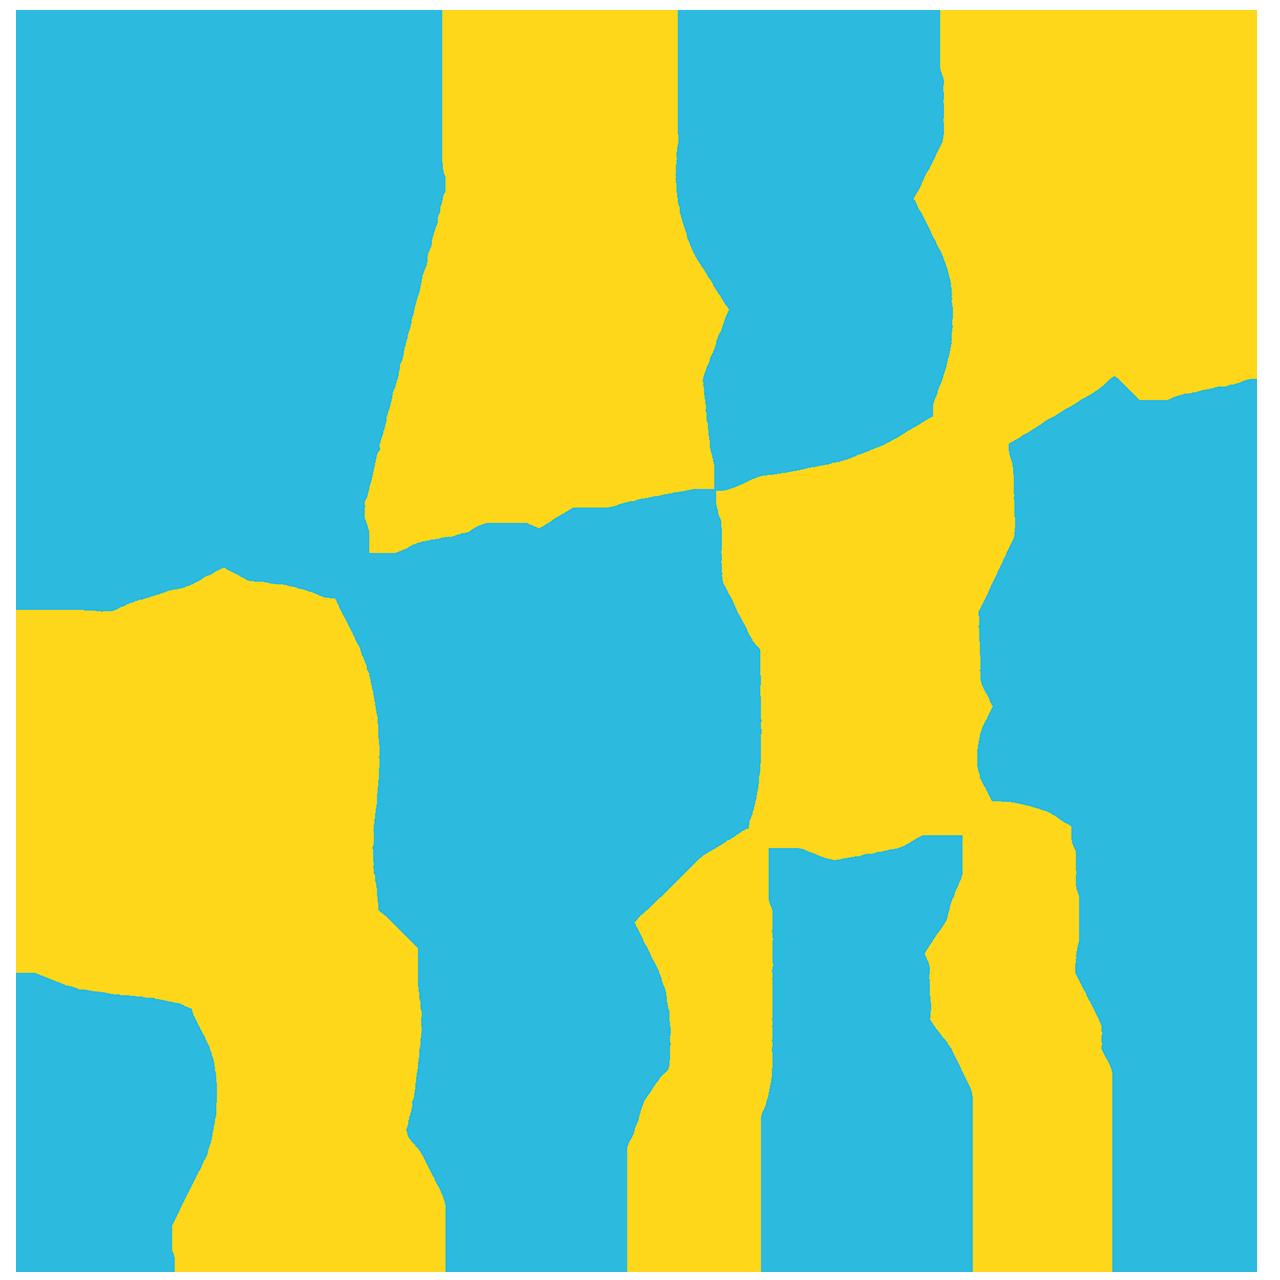 WASHOUT のロゴ